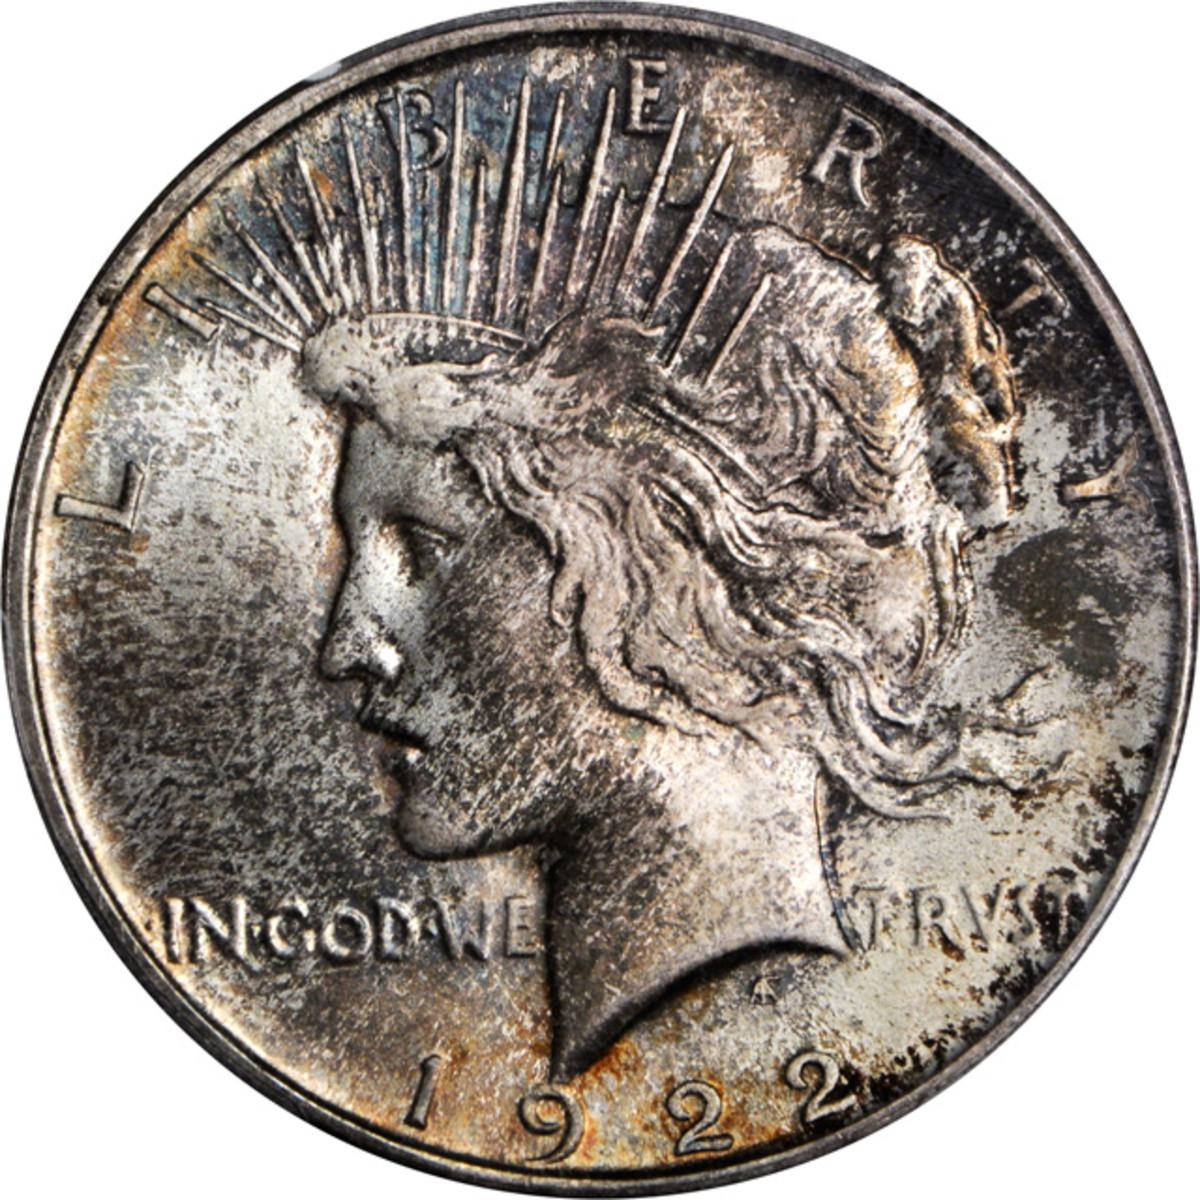 Lot 13169. 1922 Peace silver dollar. Early hub dies. PCGS MS-67). Ex: Raymond T. Baker Estate.